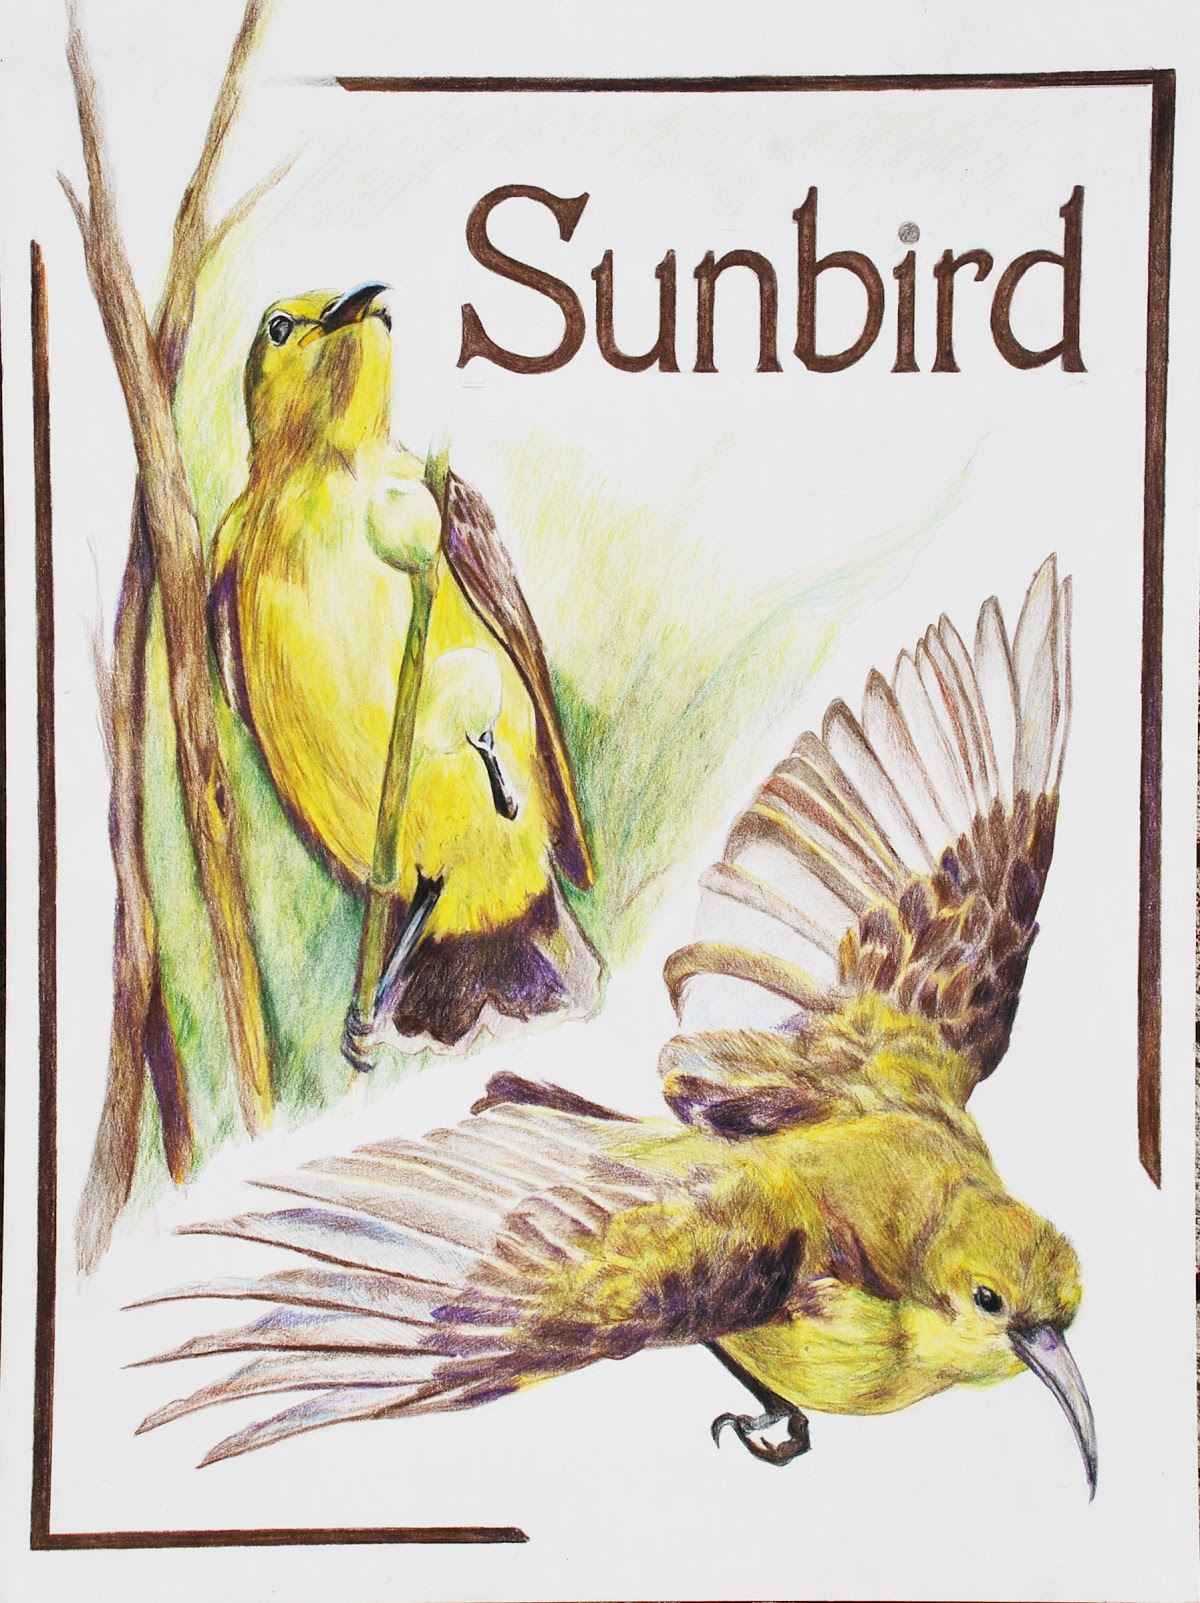 Sunbird Illustration.